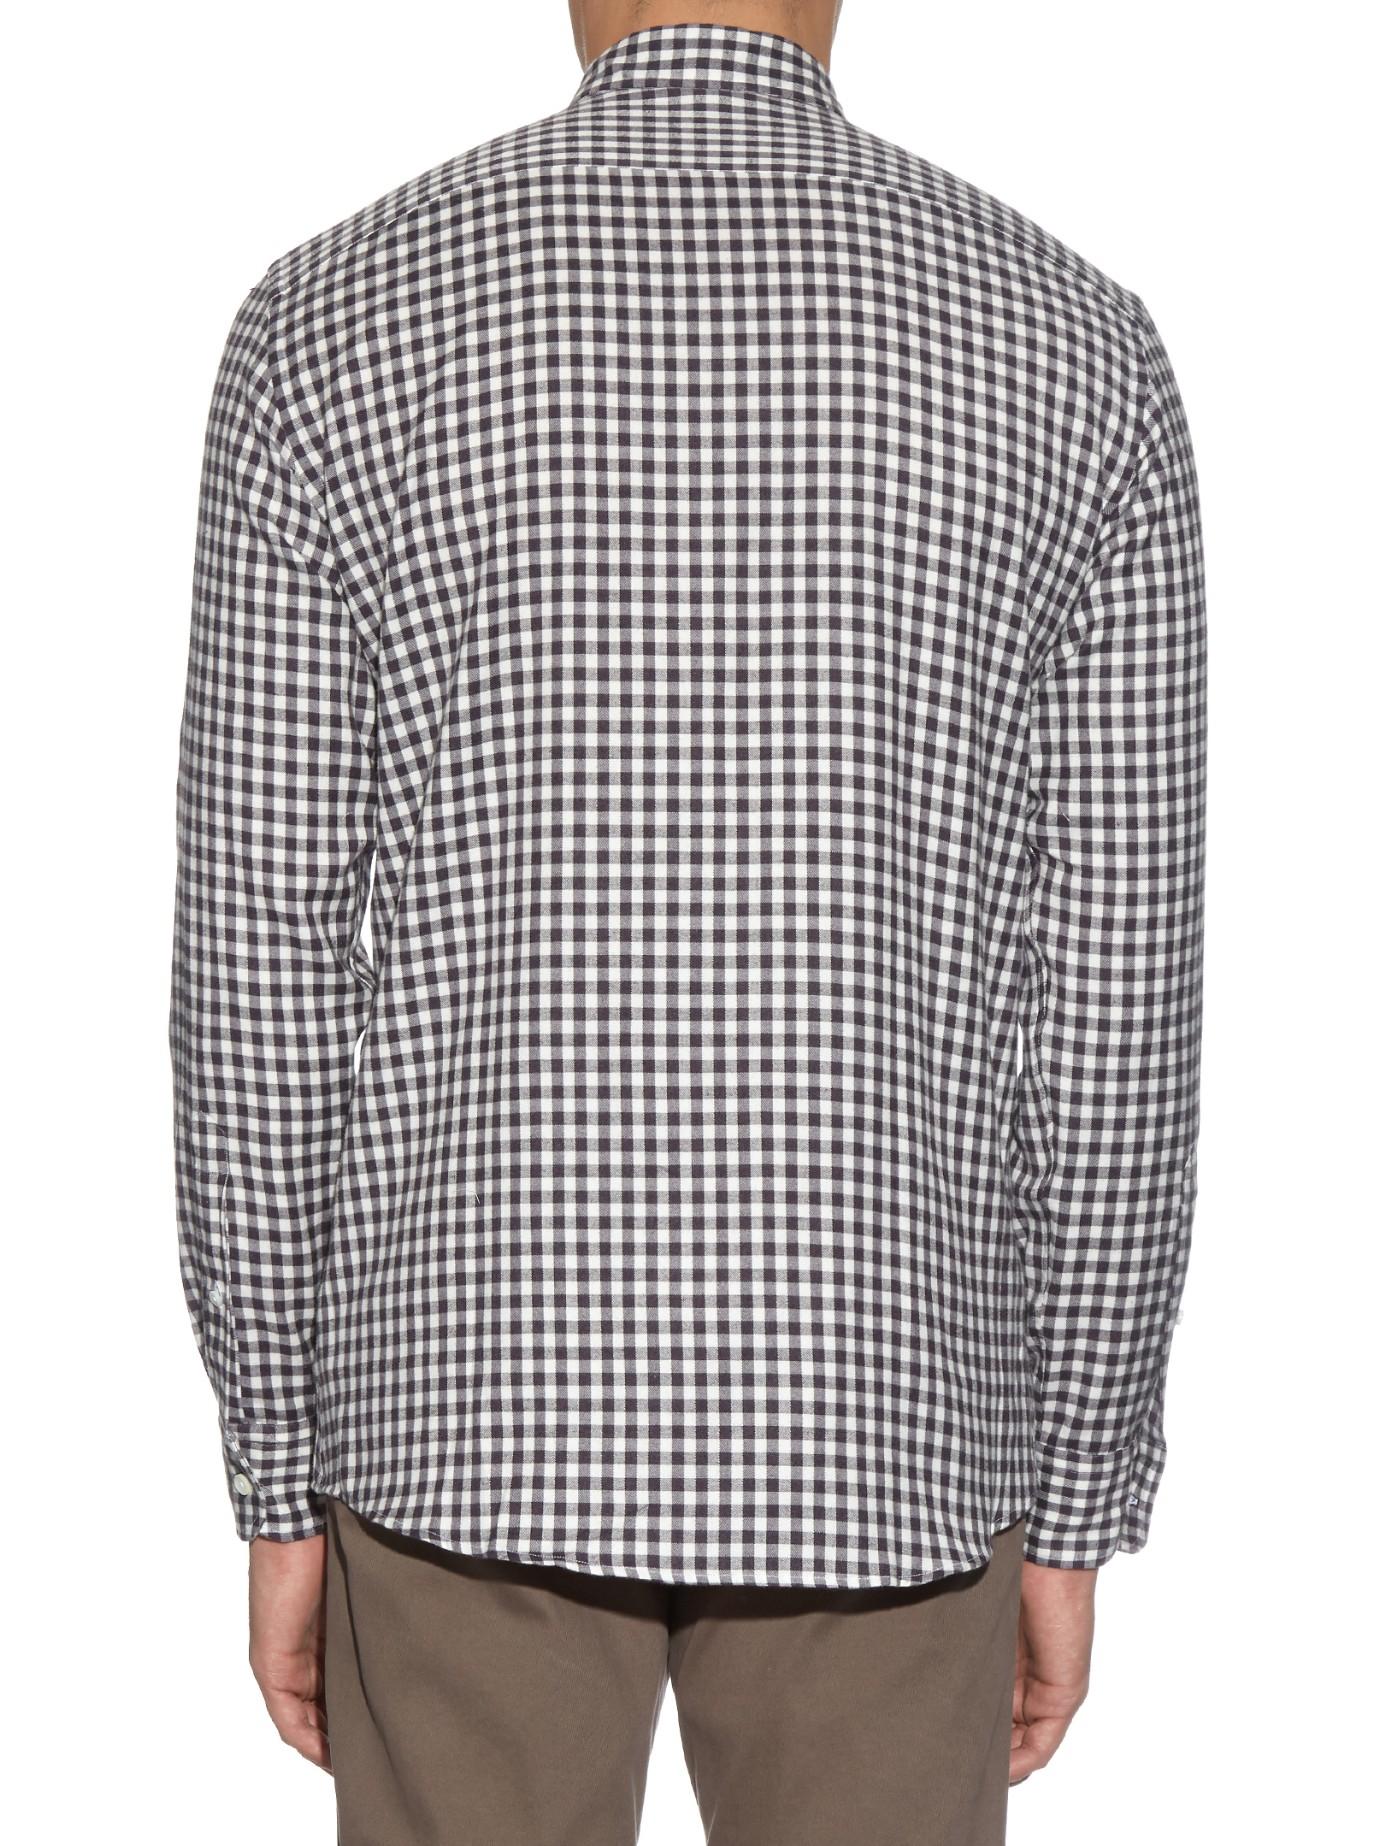 Ermenegildo zegna checked cotton flannel shirt in purple for Purple and white checked shirt